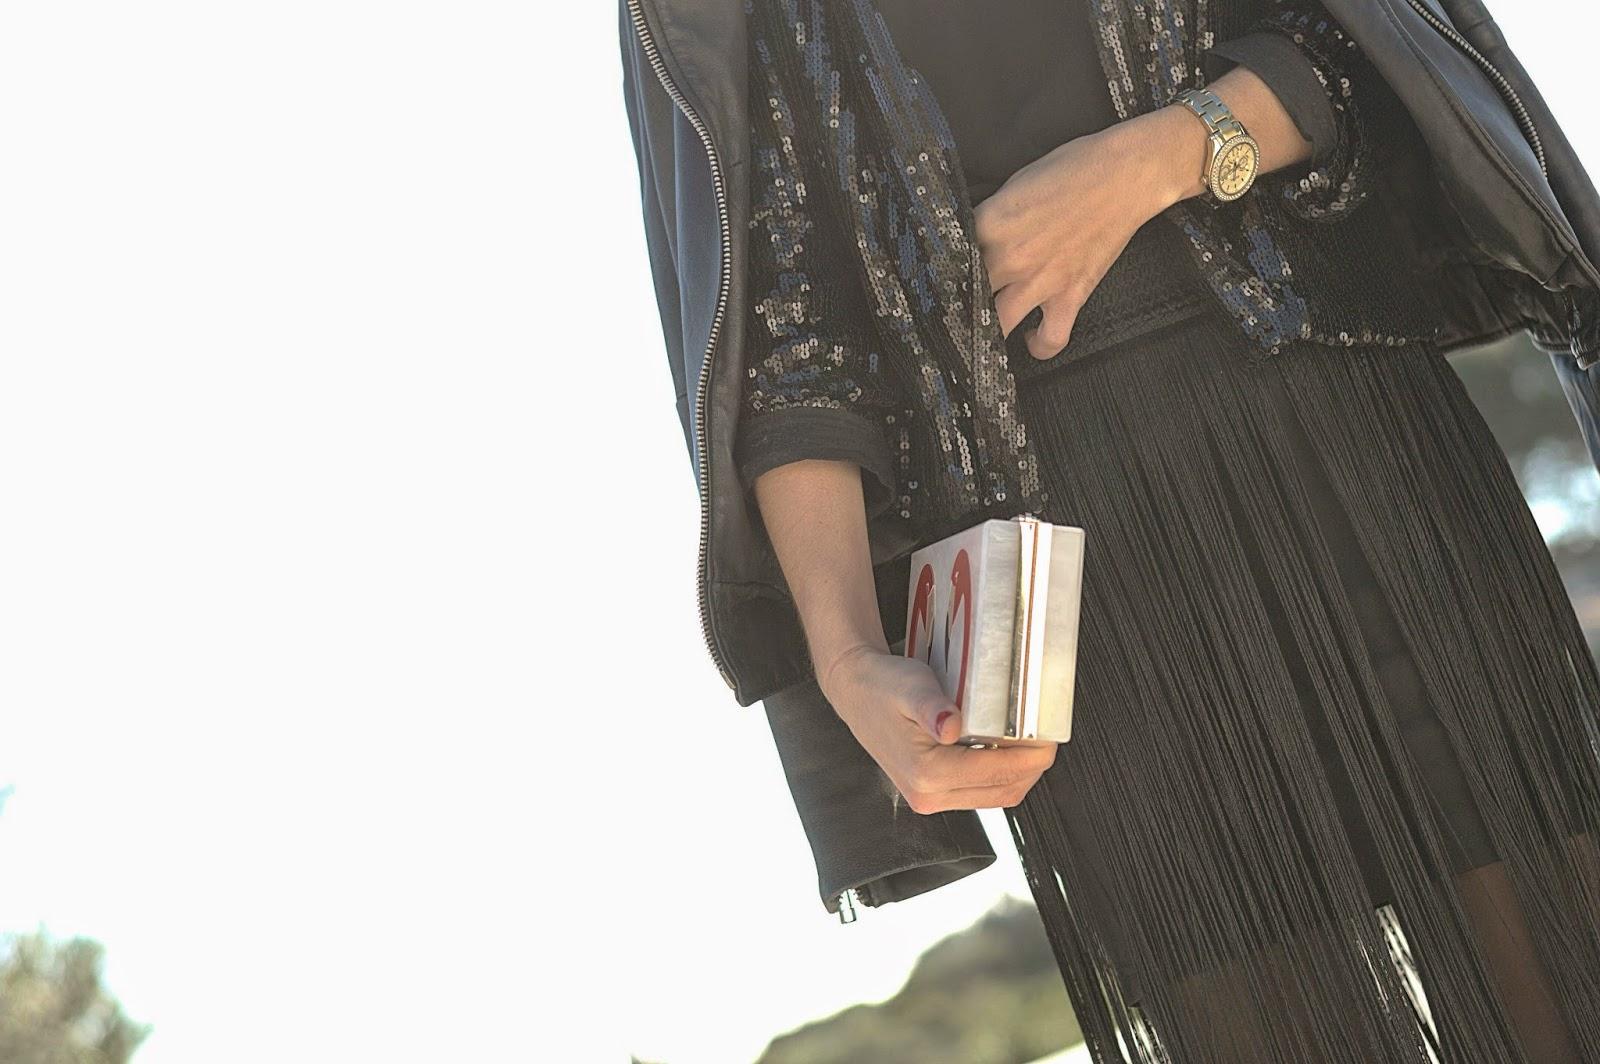 Falda de flecos H&M, top y perfecto Mango, jaqueta Kling, clutch The Code, Stilettos Menbur